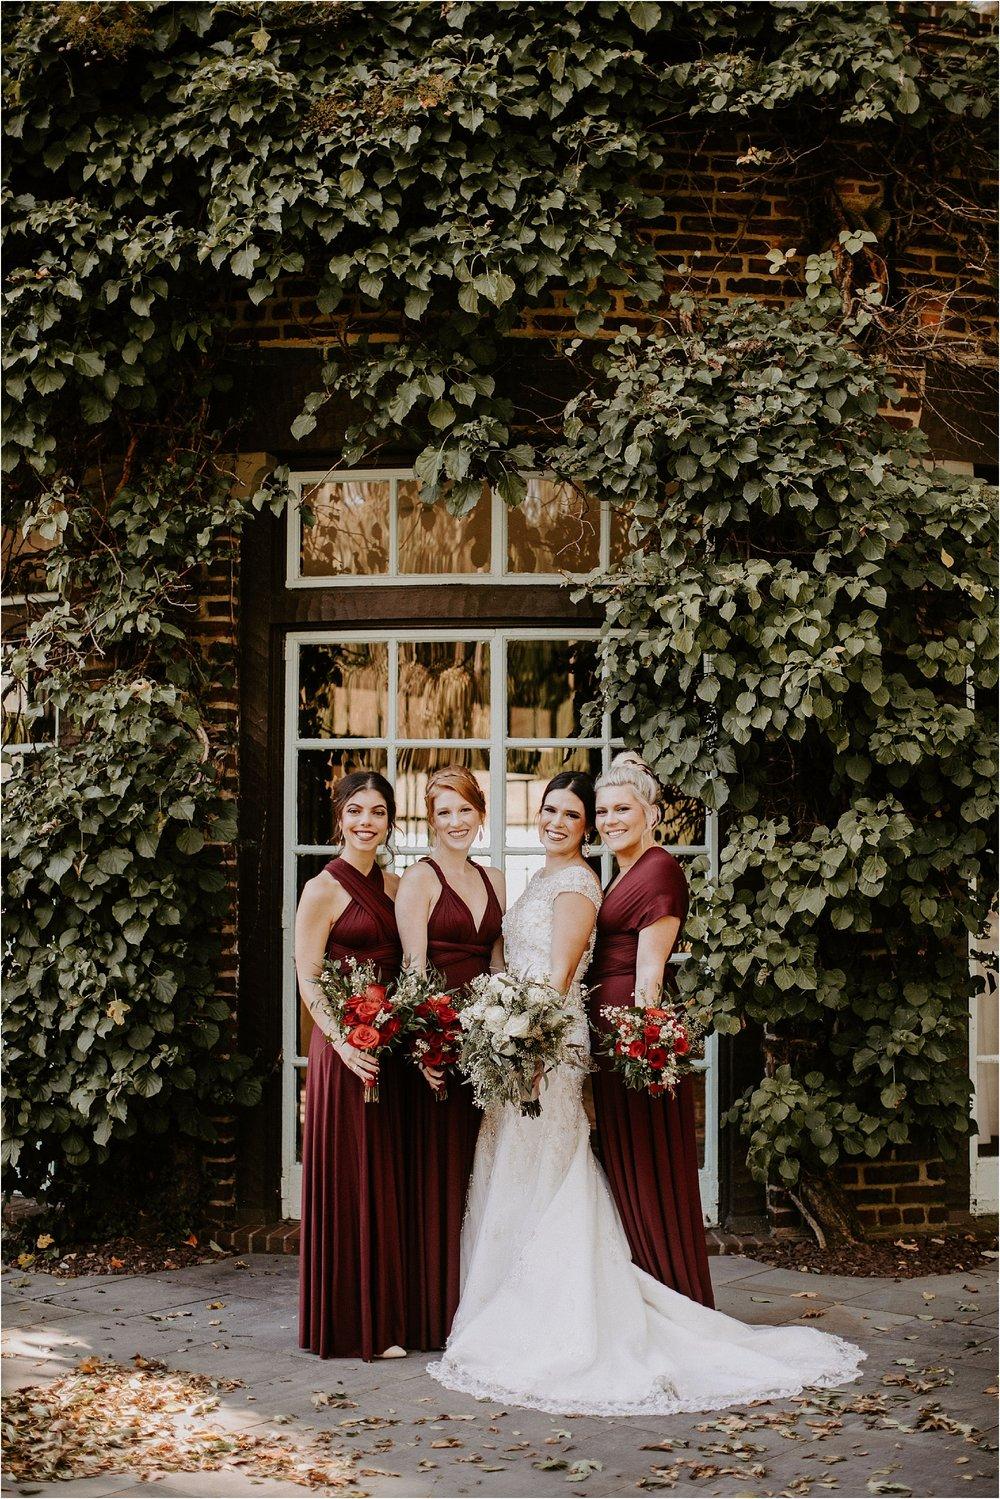 Sarah_Brookhart_Philadelphia_Wedding_Photographer_0017.jpg